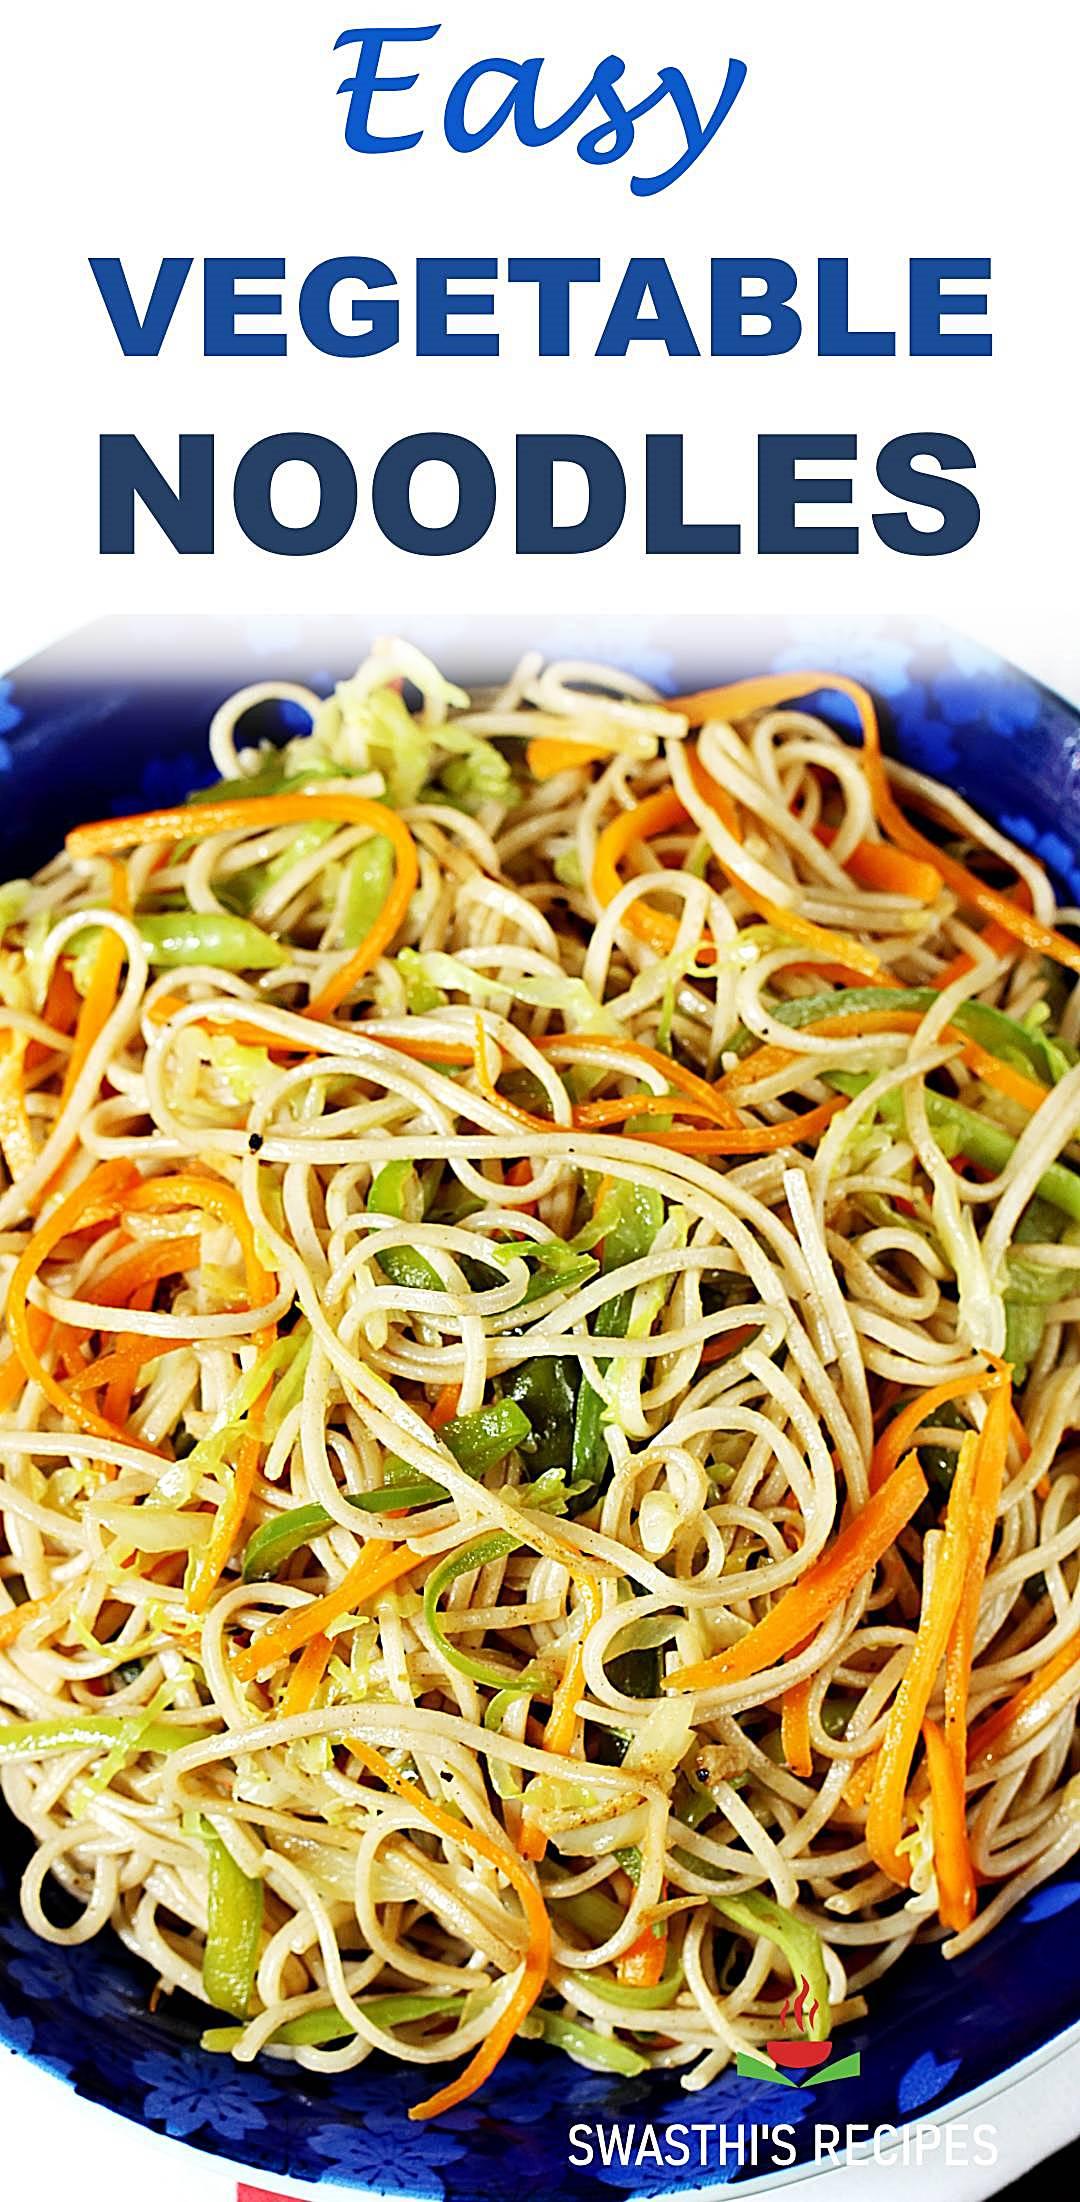 Veg noodles recipe (Vegetable noodles)